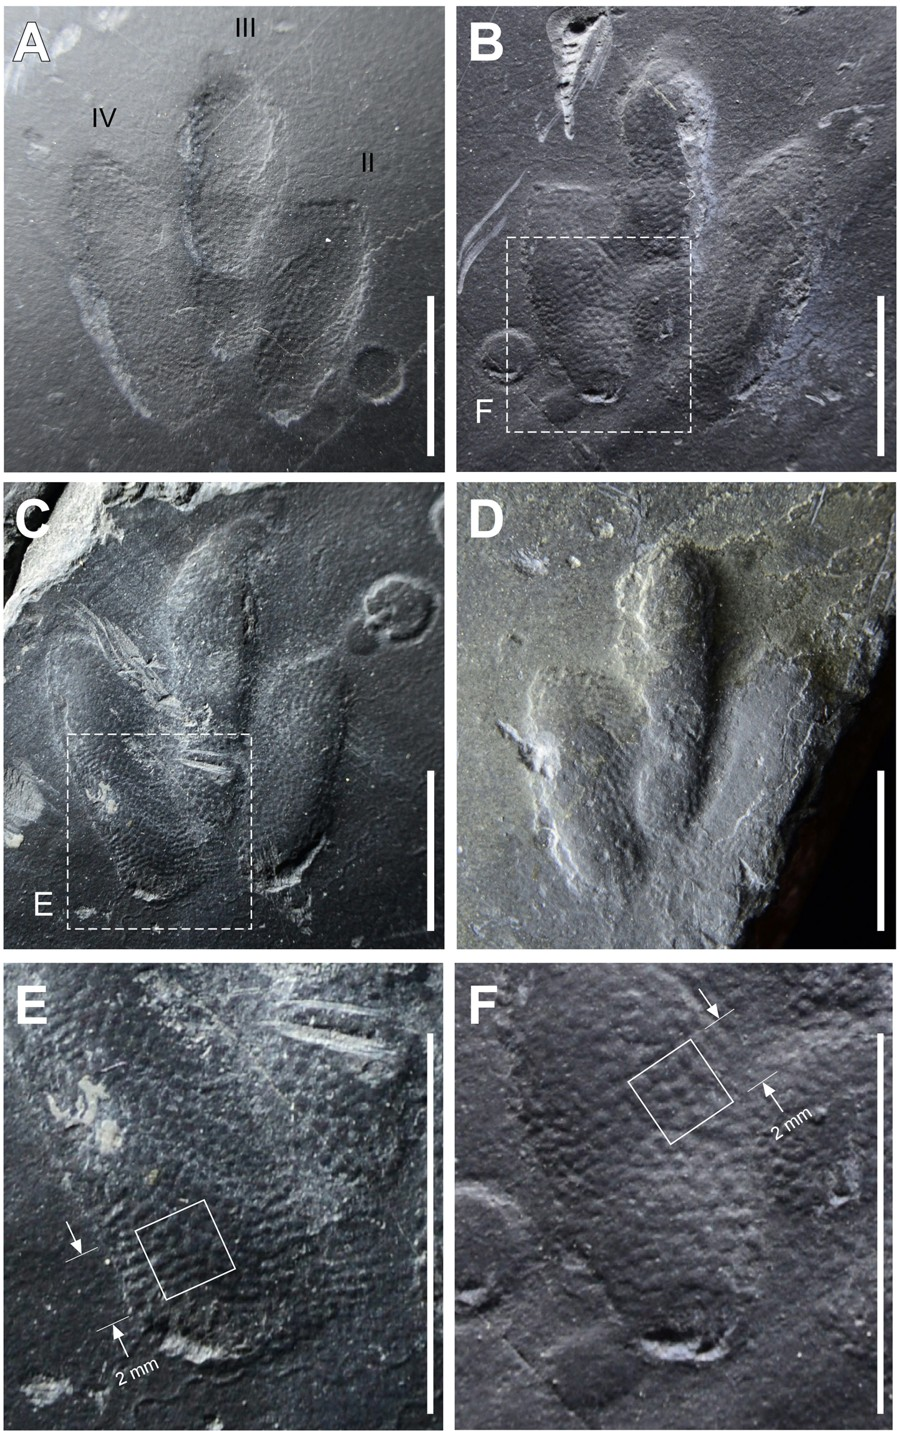 Vestígio foi localizado na cidade de Jinju, na Coréia (Foto: Exquisitely-preserved, high-definition skin traces in diminutive theropod tracks from the Cretaceous of Korea)